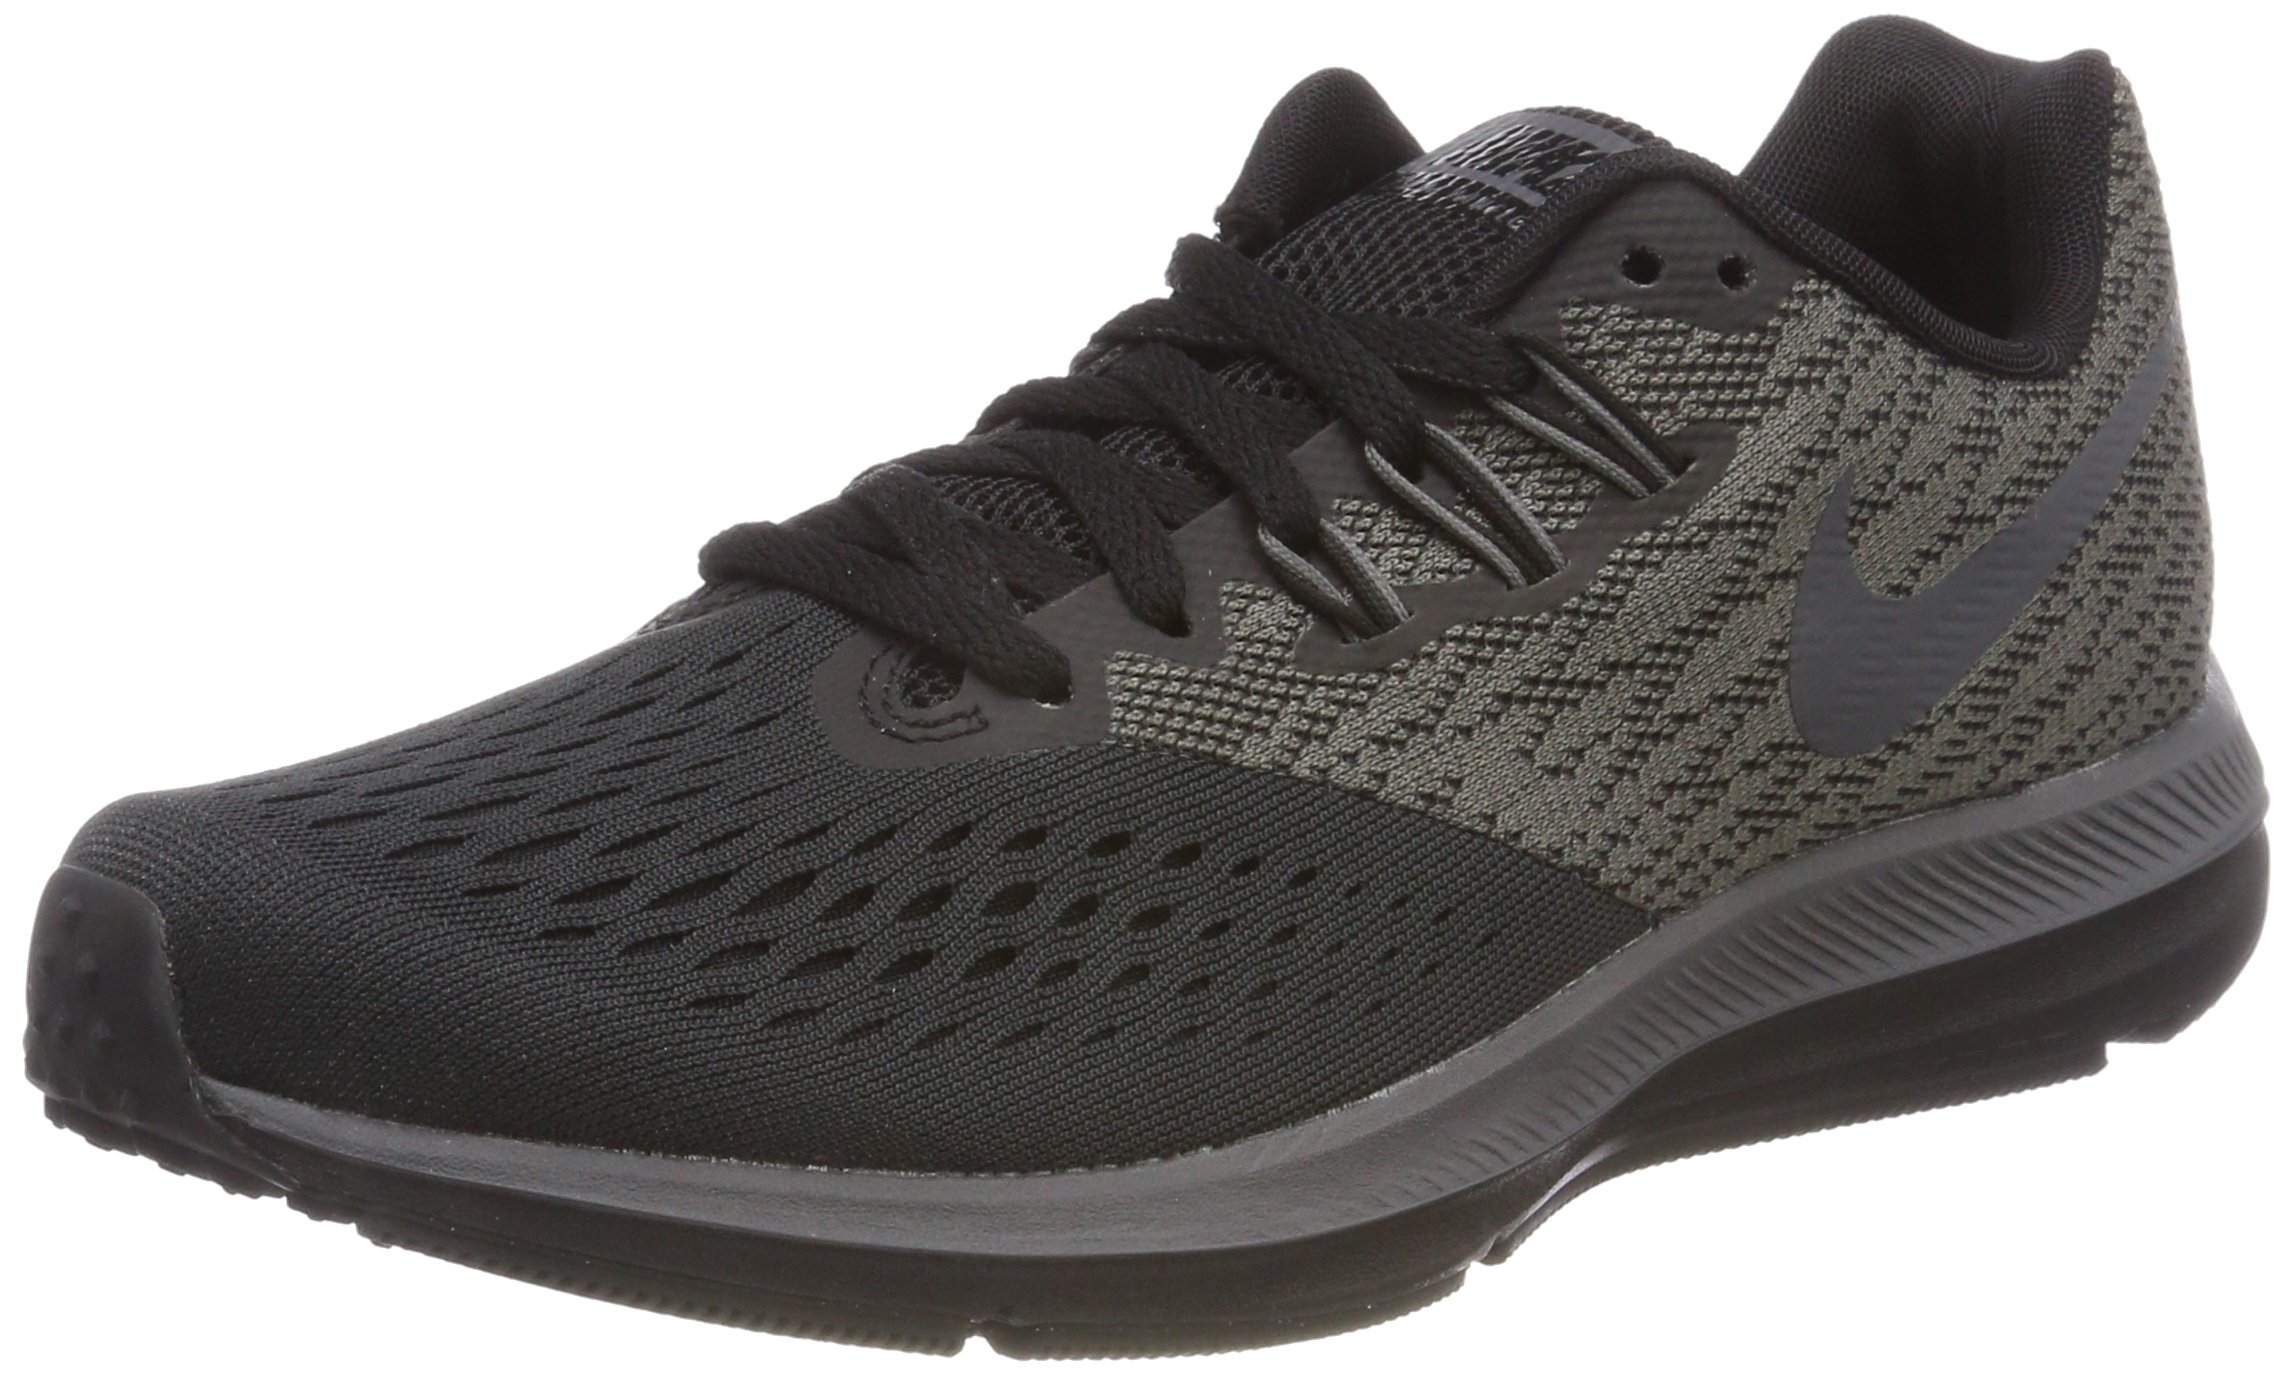 74ae8e9ca9a9d NIKE Women's Air Zoom Winflo 4 Running Shoe Anthracite/Dark Grey-Black 10.5